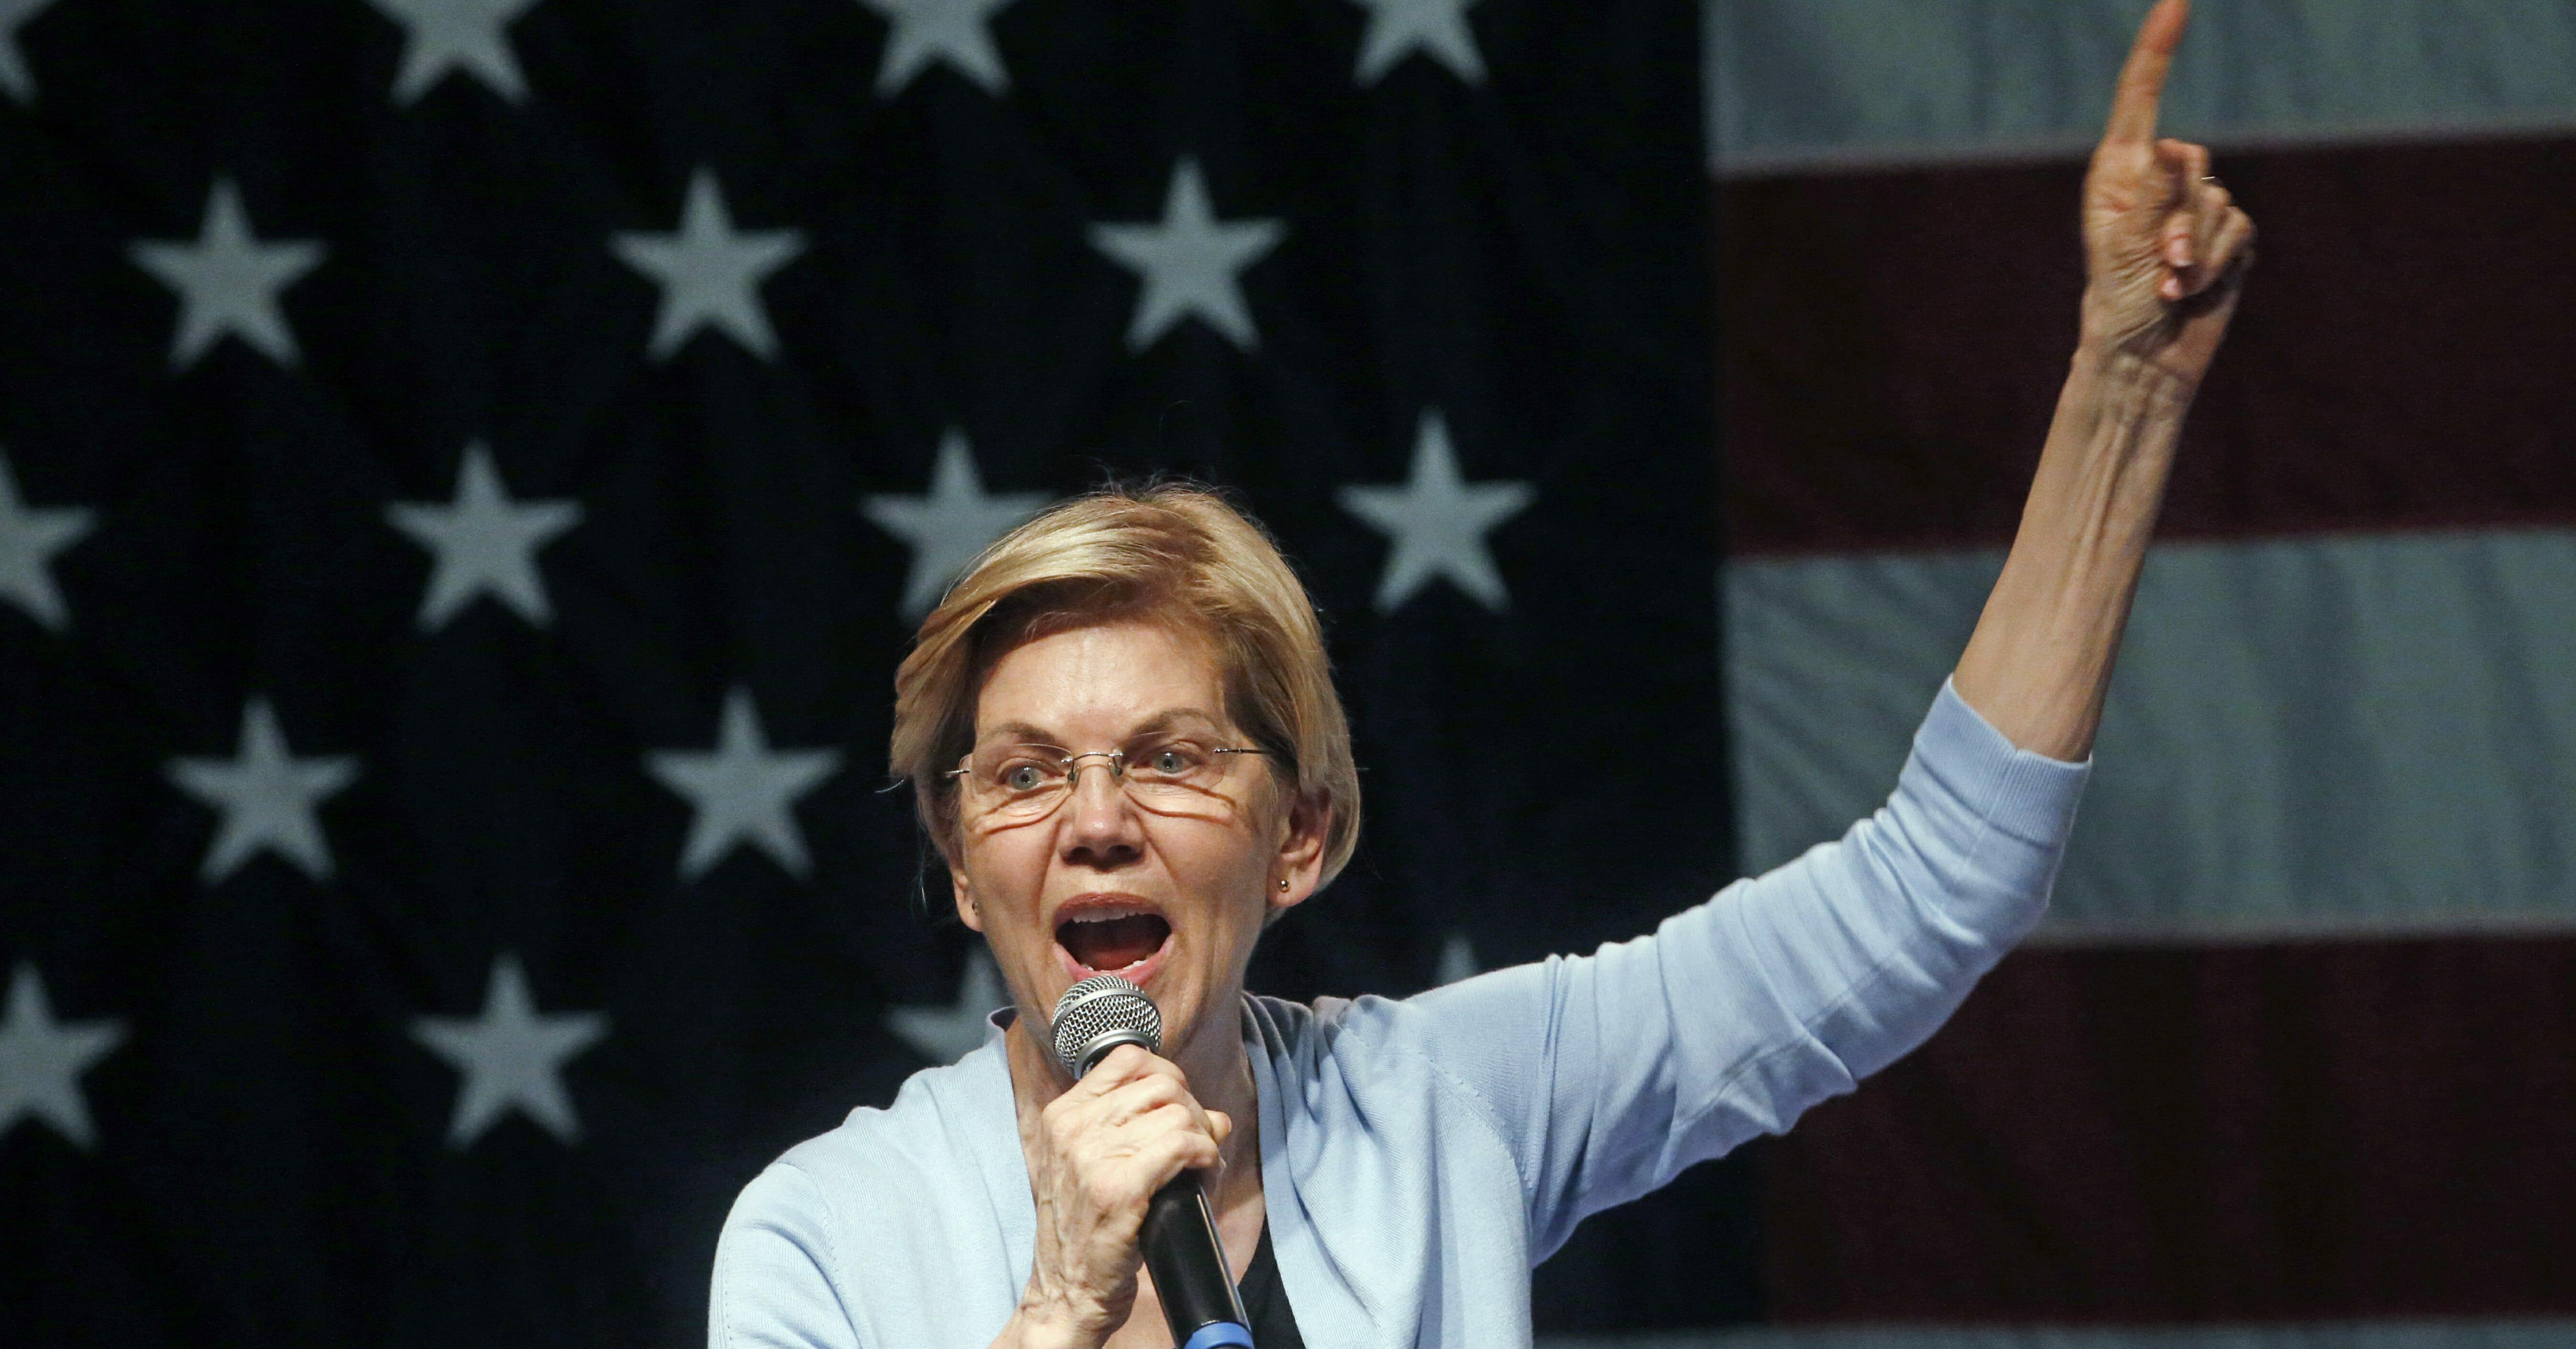 Democratic presidential candidate Sen. Elizabeth Warren speaks during a campaign rally Wednesday, April 17, 2019, in Salt Lake City.